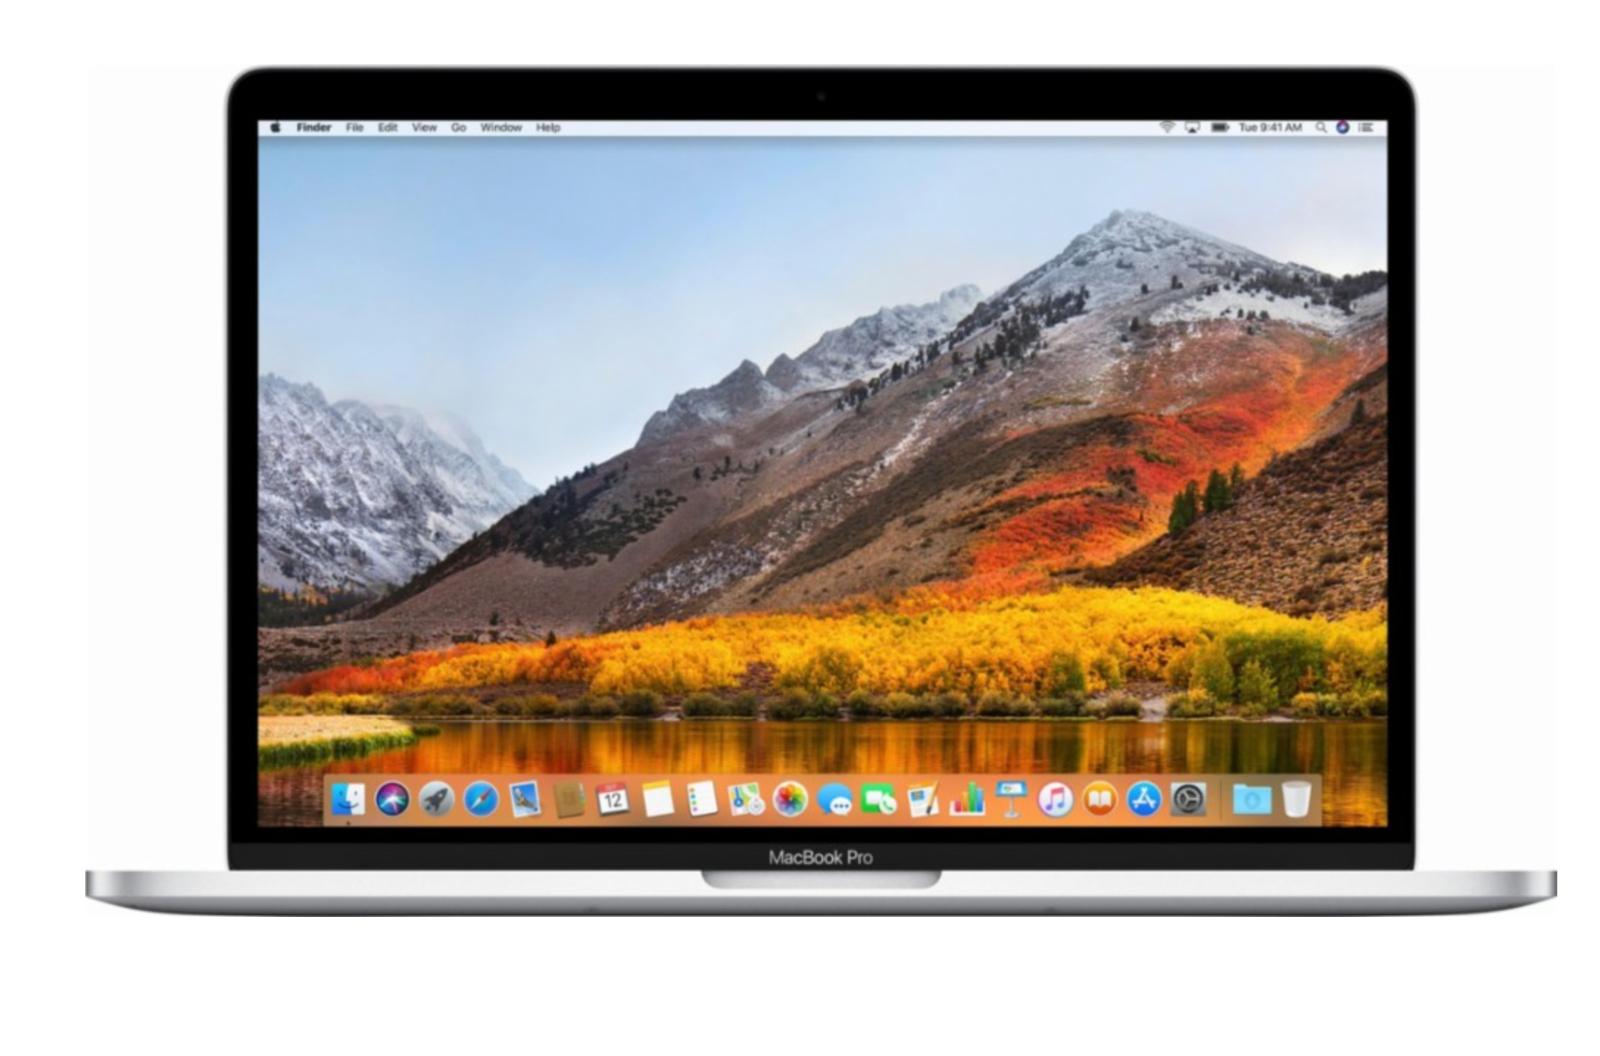 "BRAND NEW Apple MacBook Pro 13"" Laptop 256GB MPXU2LL/A Silver *Latest Version*"